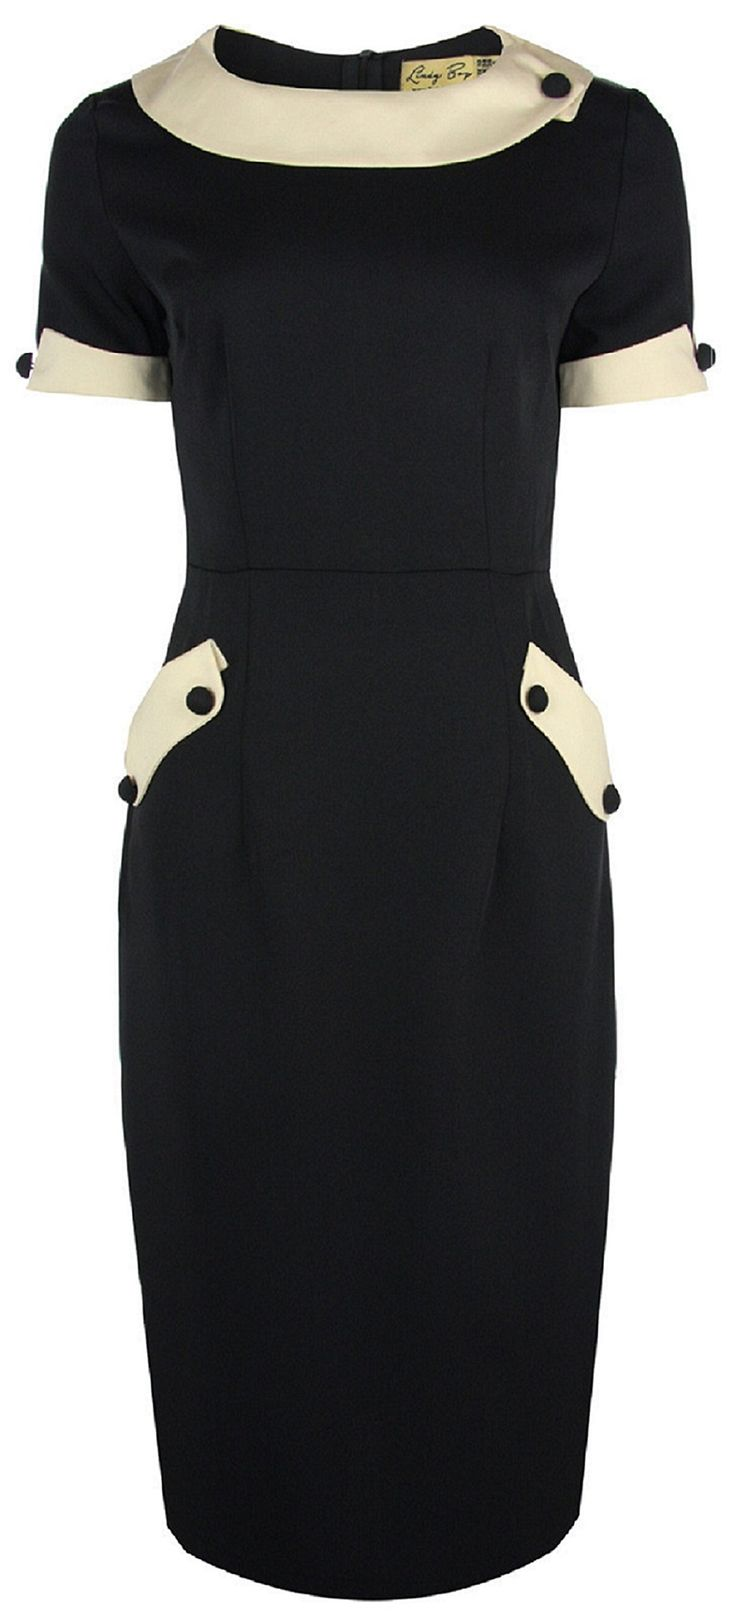 Lindy Bop 'Petite' 'Tiffany' Vintage 50s Black Office Style Wiggle Dress (XXS, Black)